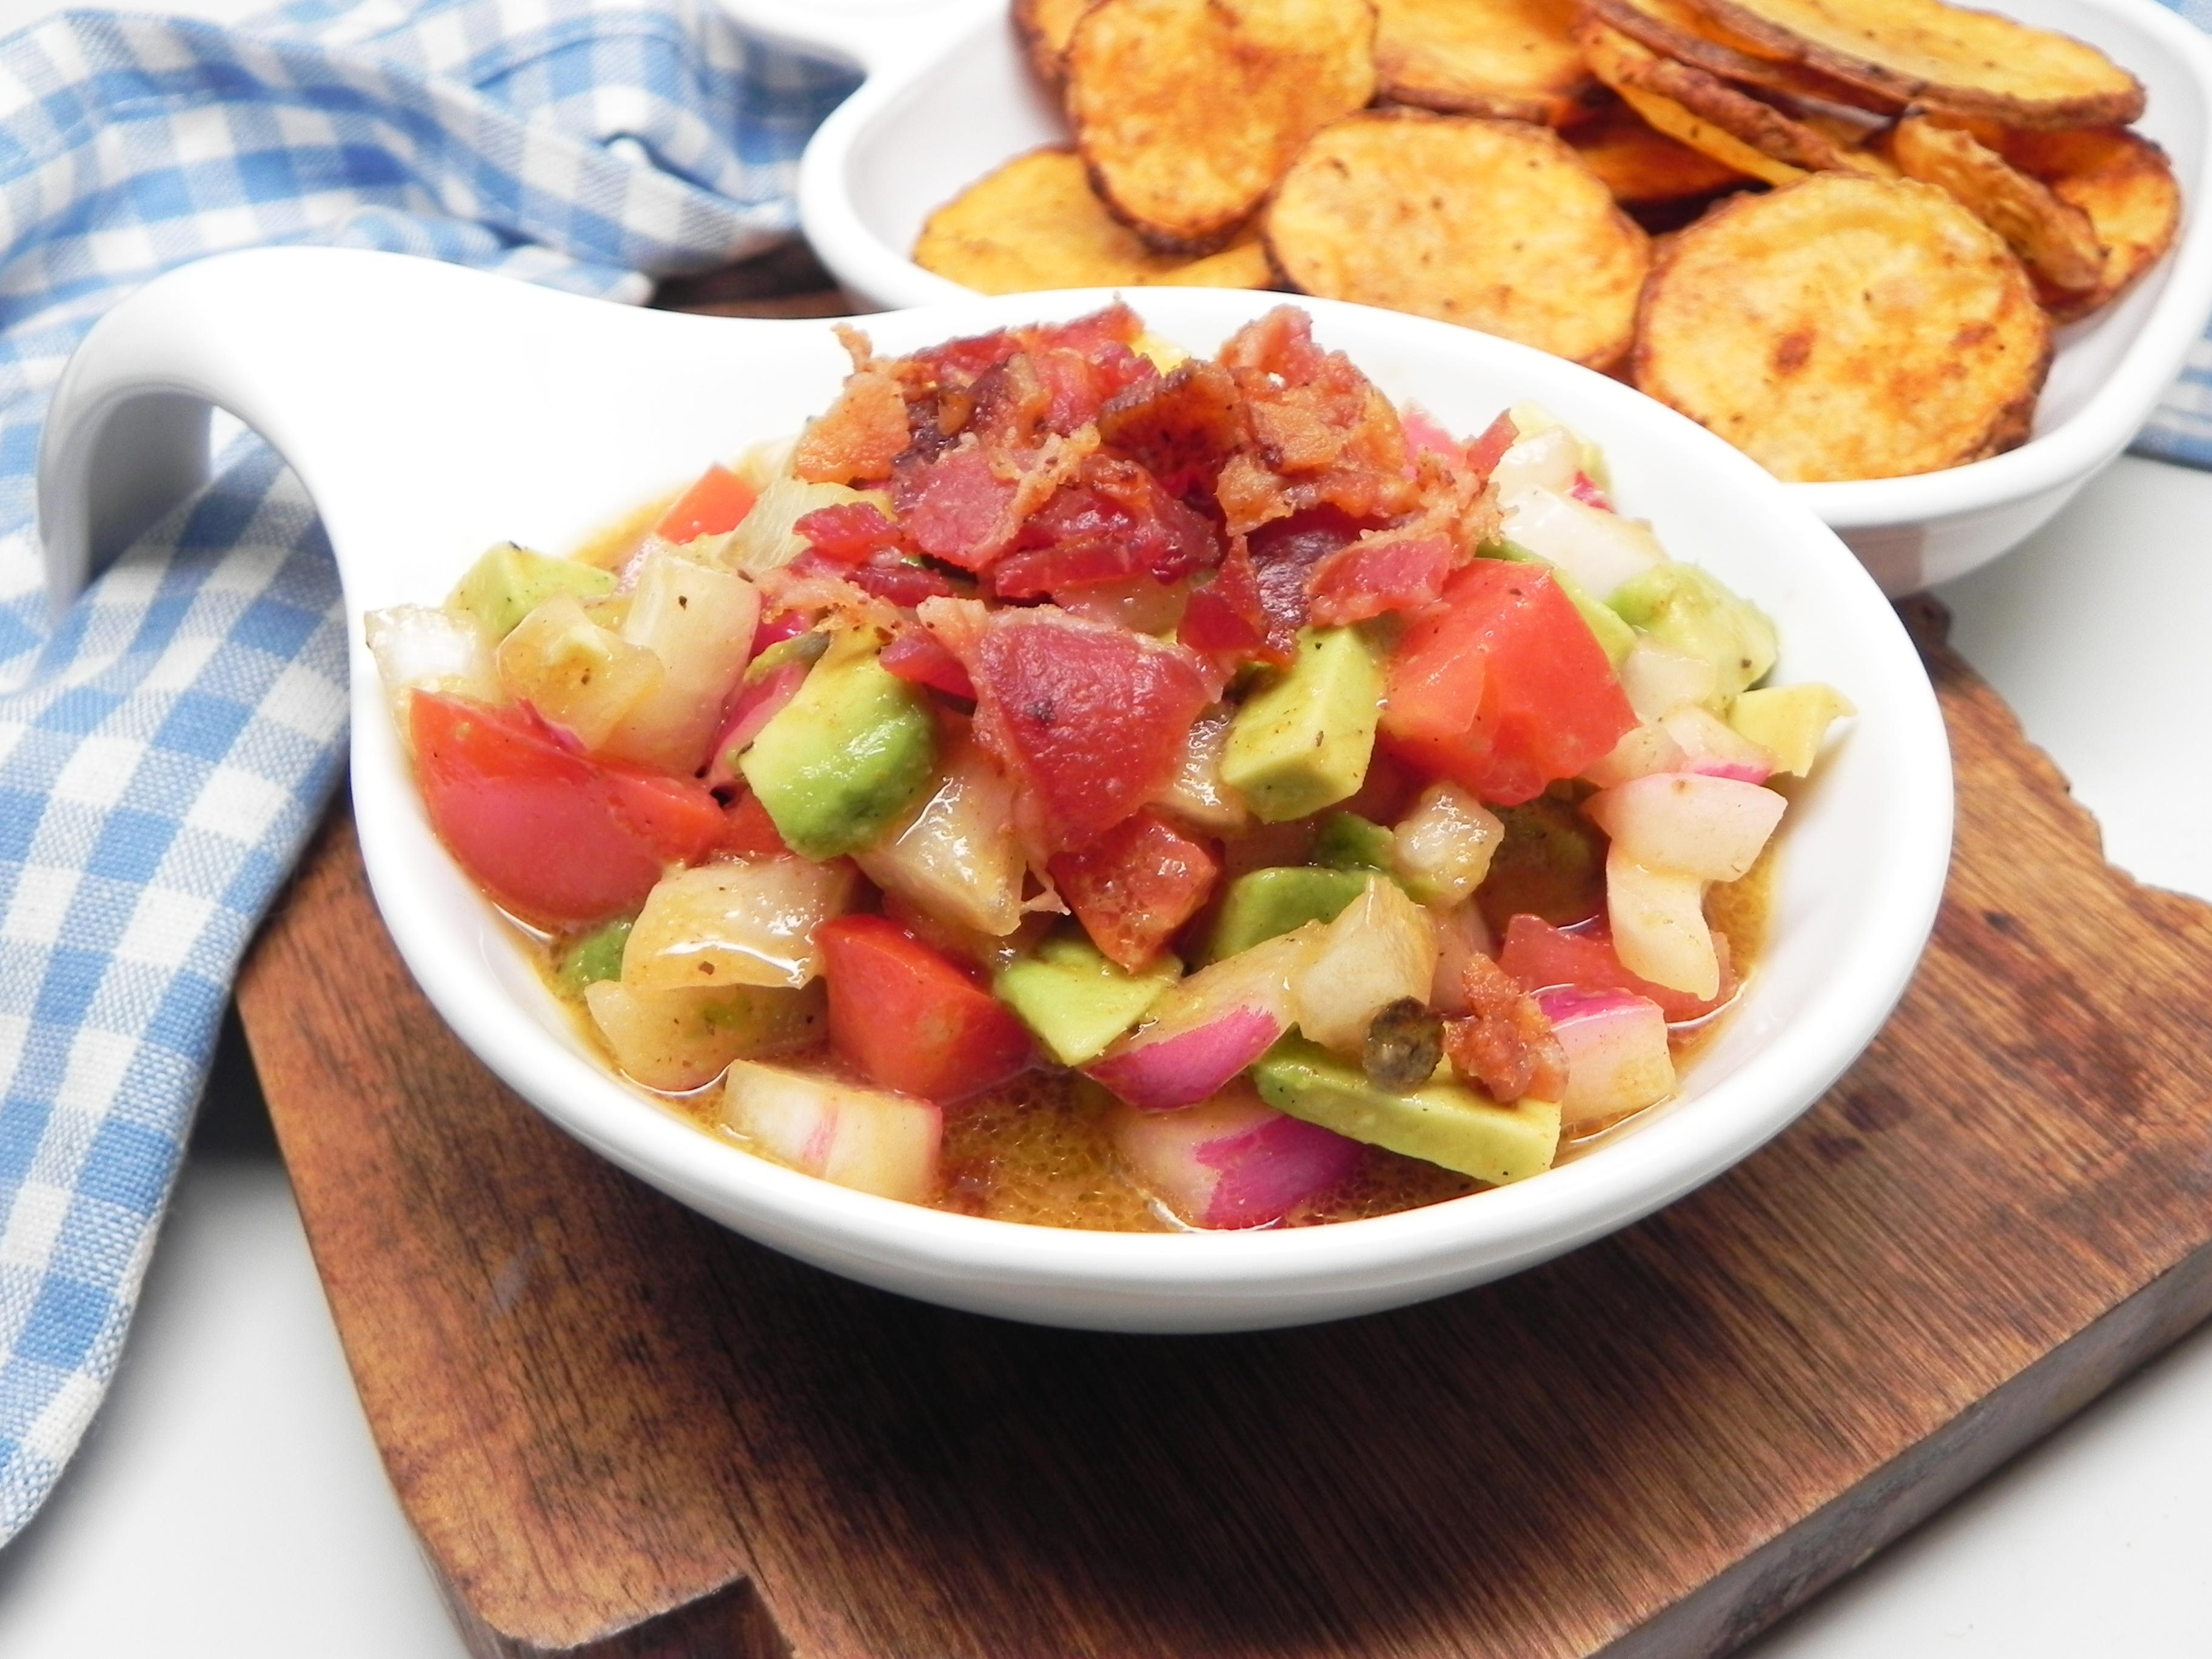 Bacon, Avocado, and Tomato Salad